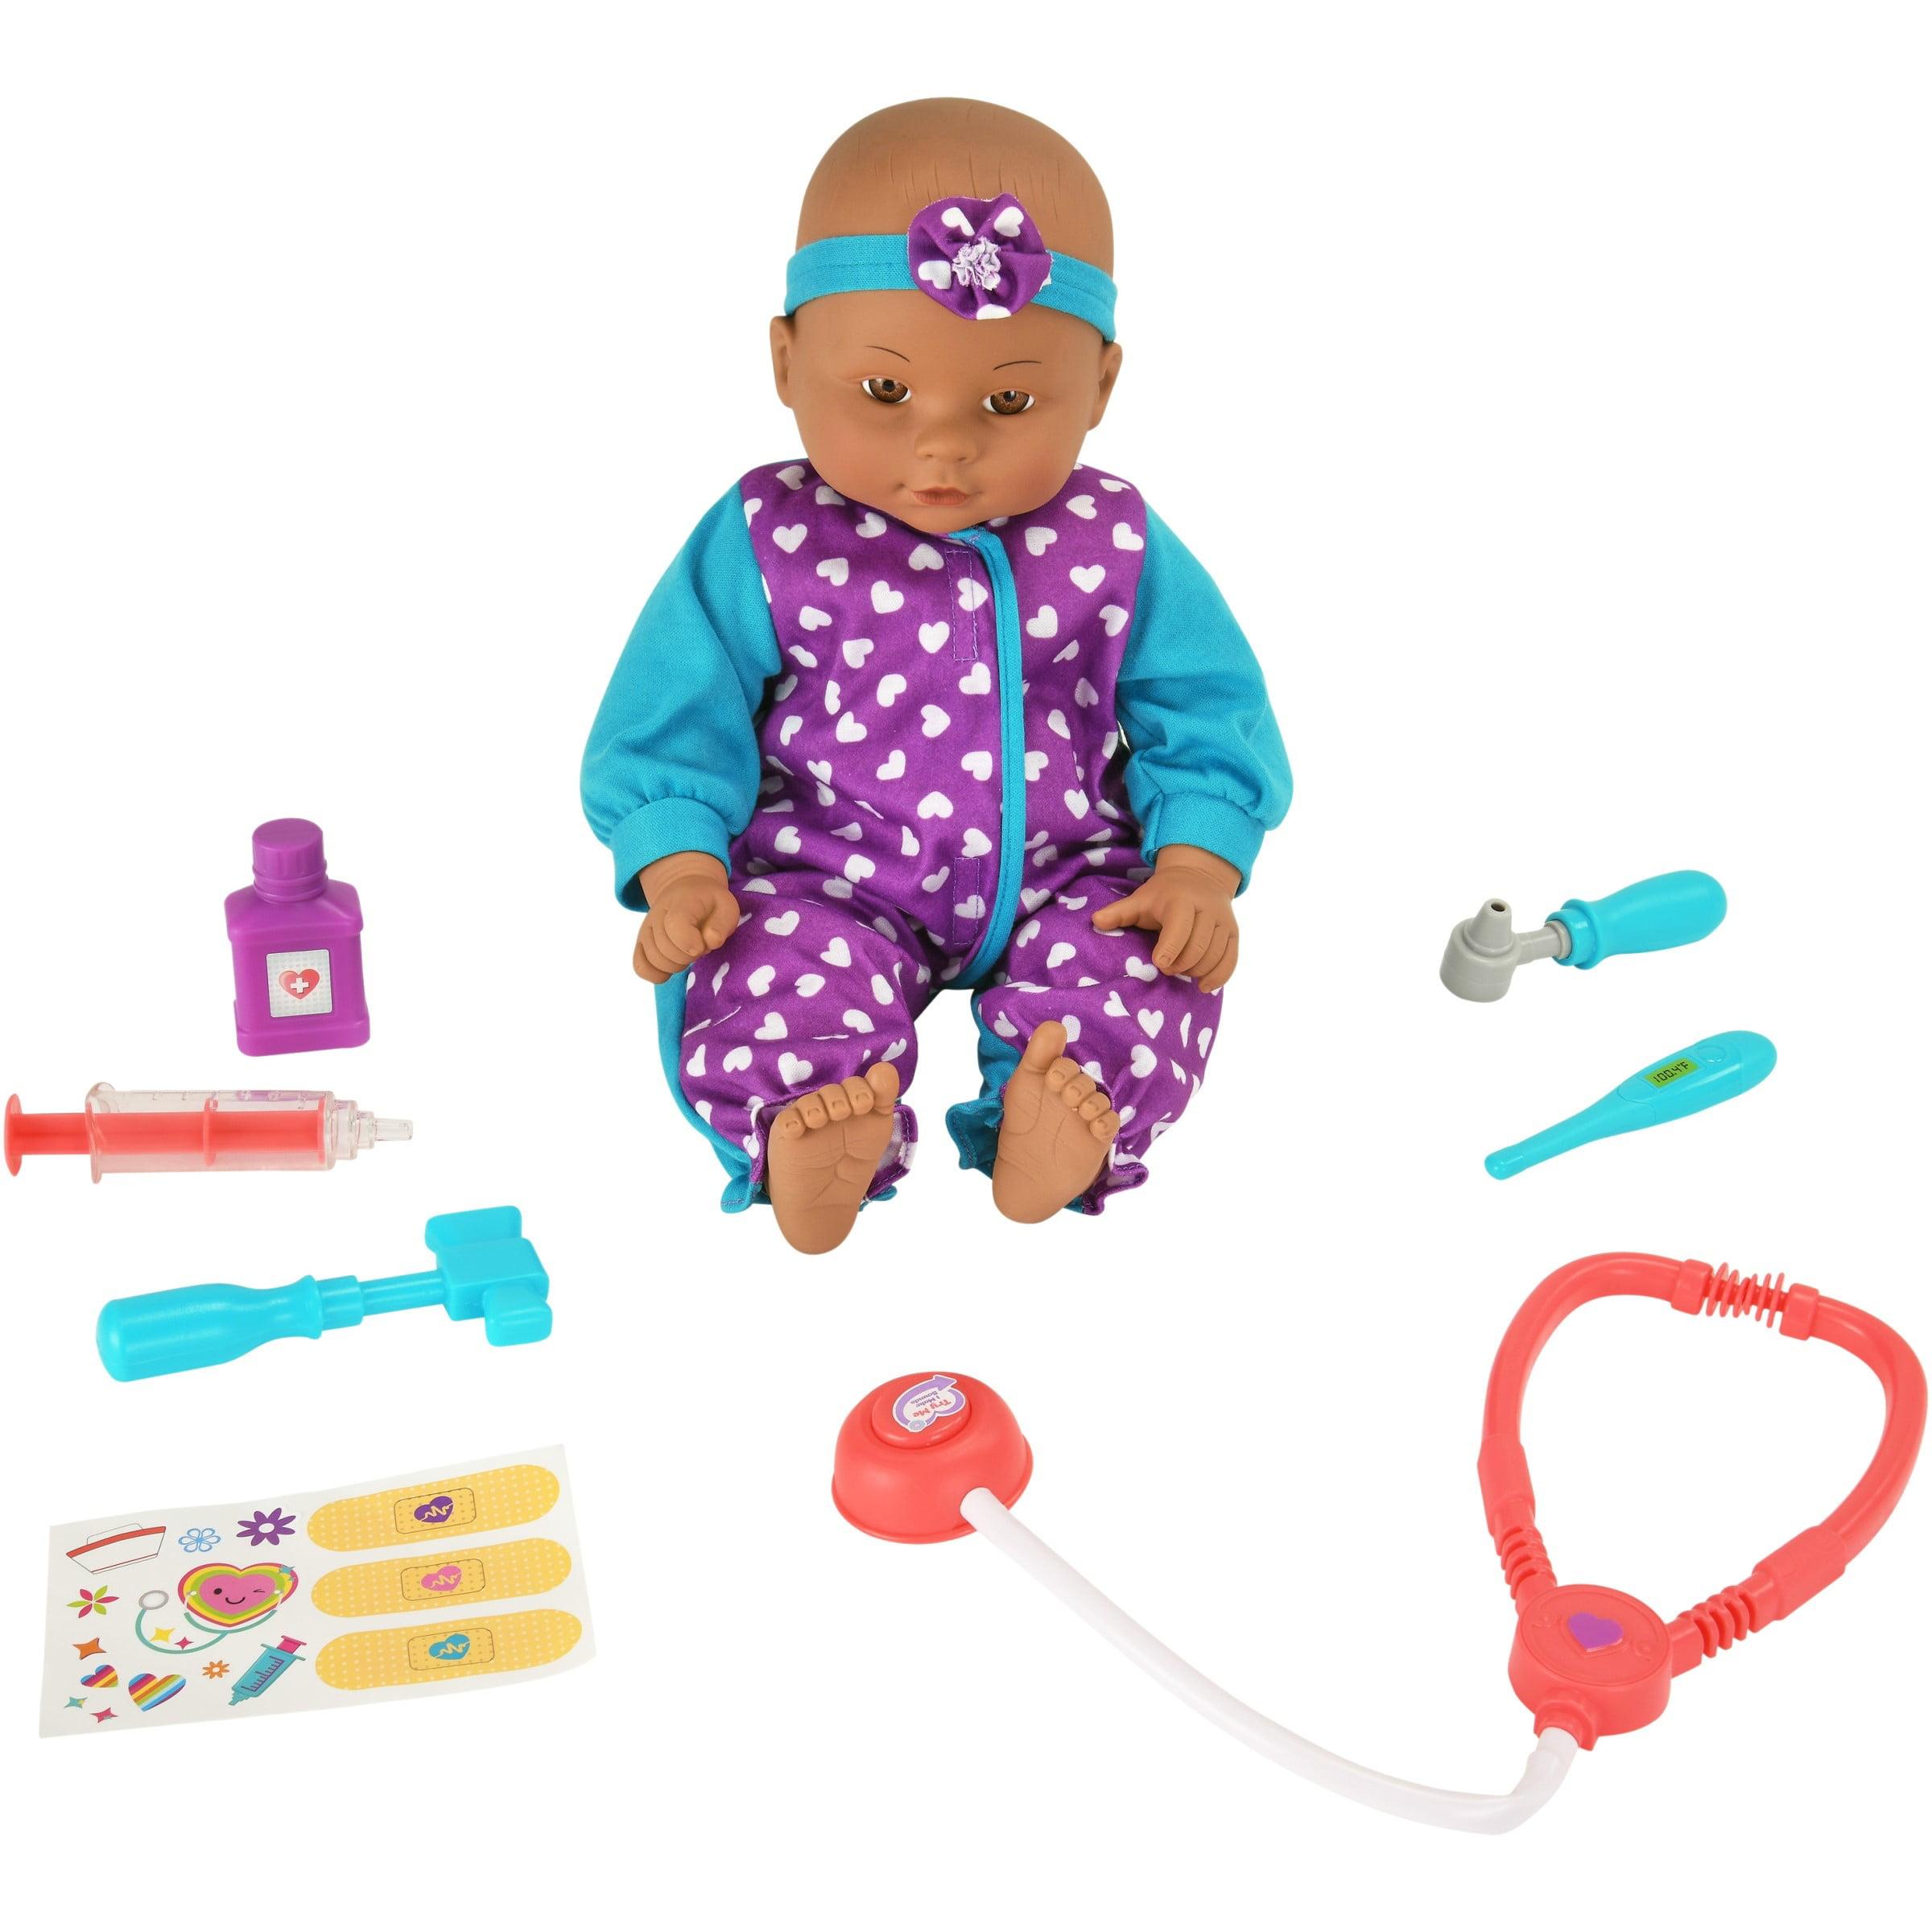 My Sweet Love 16-piece Purple & Teal Baby Doll Doctor Play Set